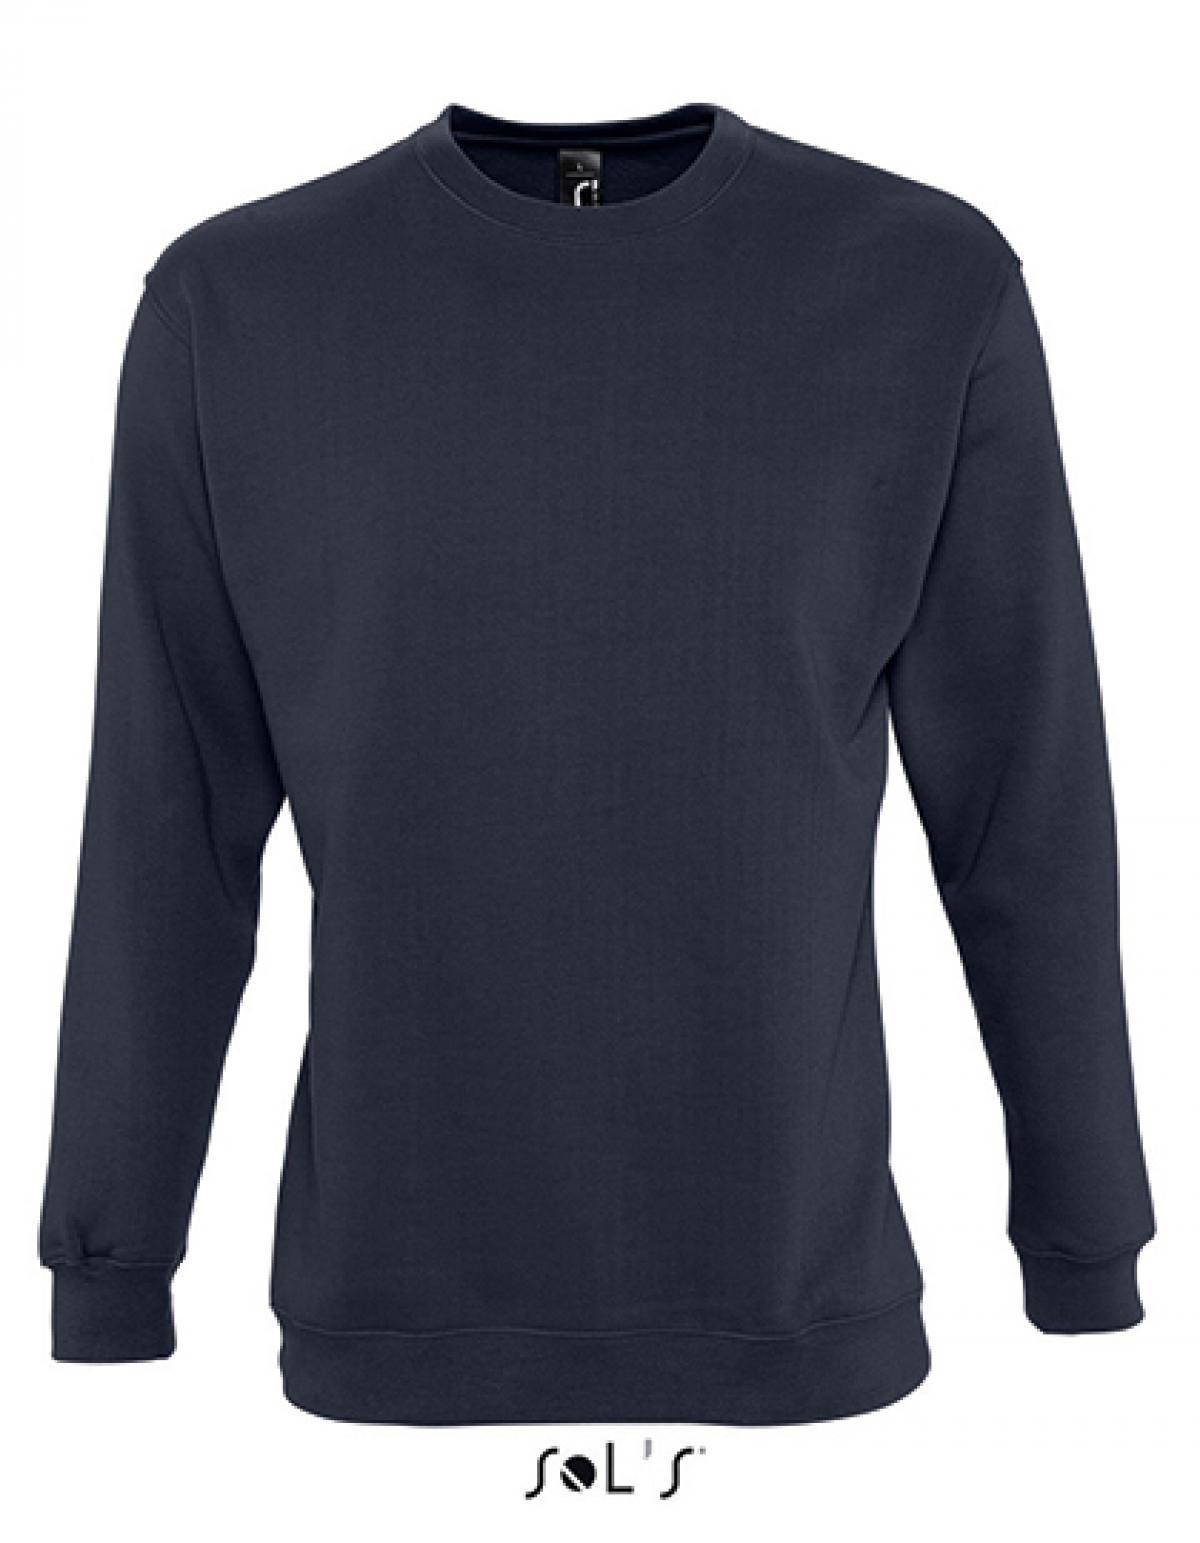 unisex sweatshirt supreme rexlander s. Black Bedroom Furniture Sets. Home Design Ideas